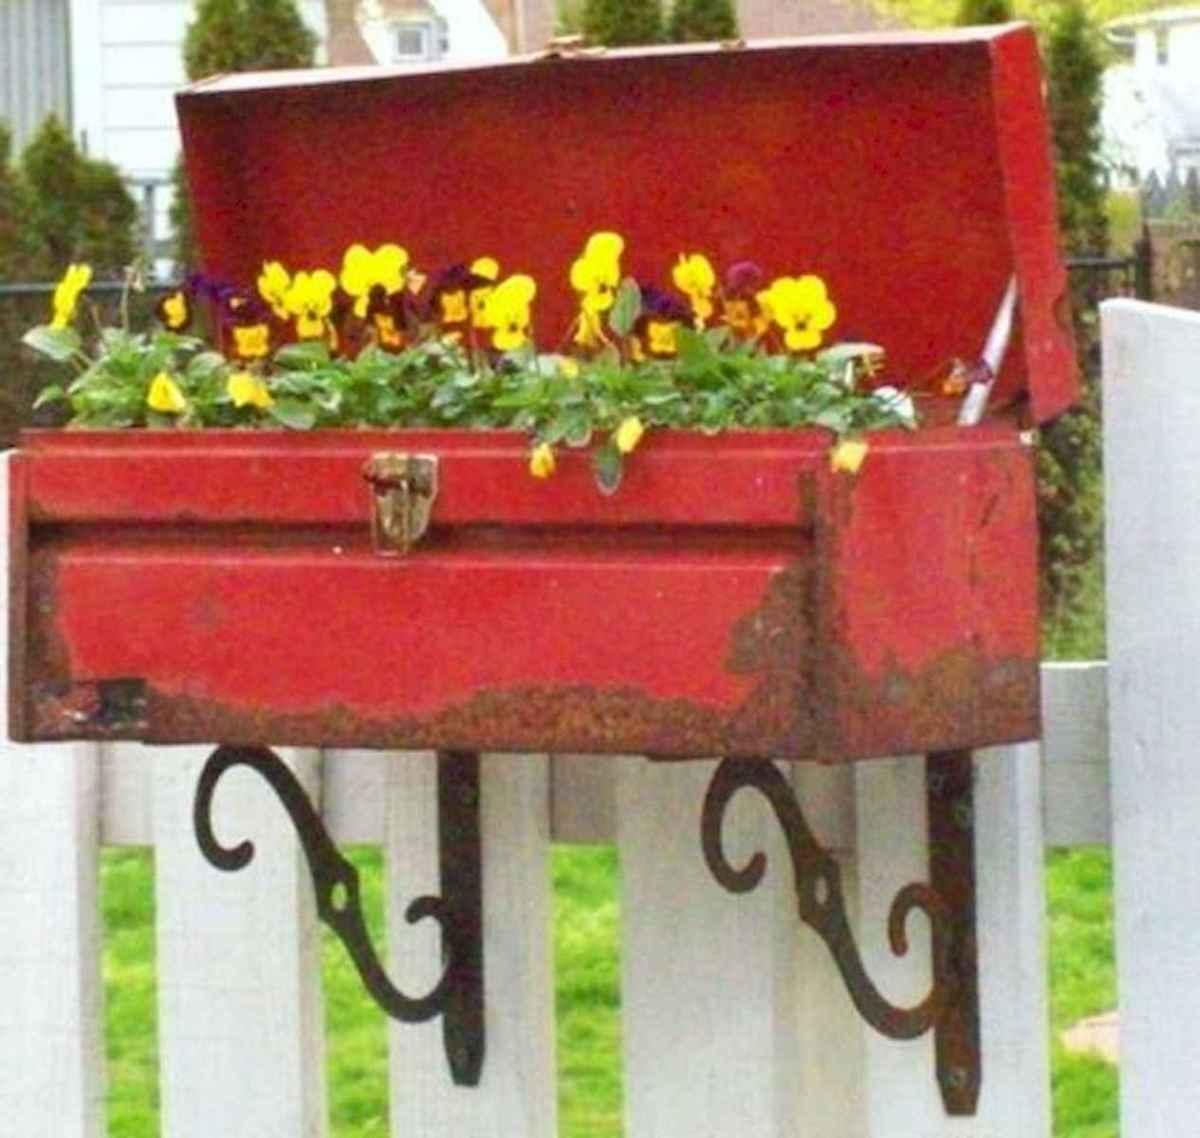 70 creative and genius garden art from junk design ideas for summer (29)